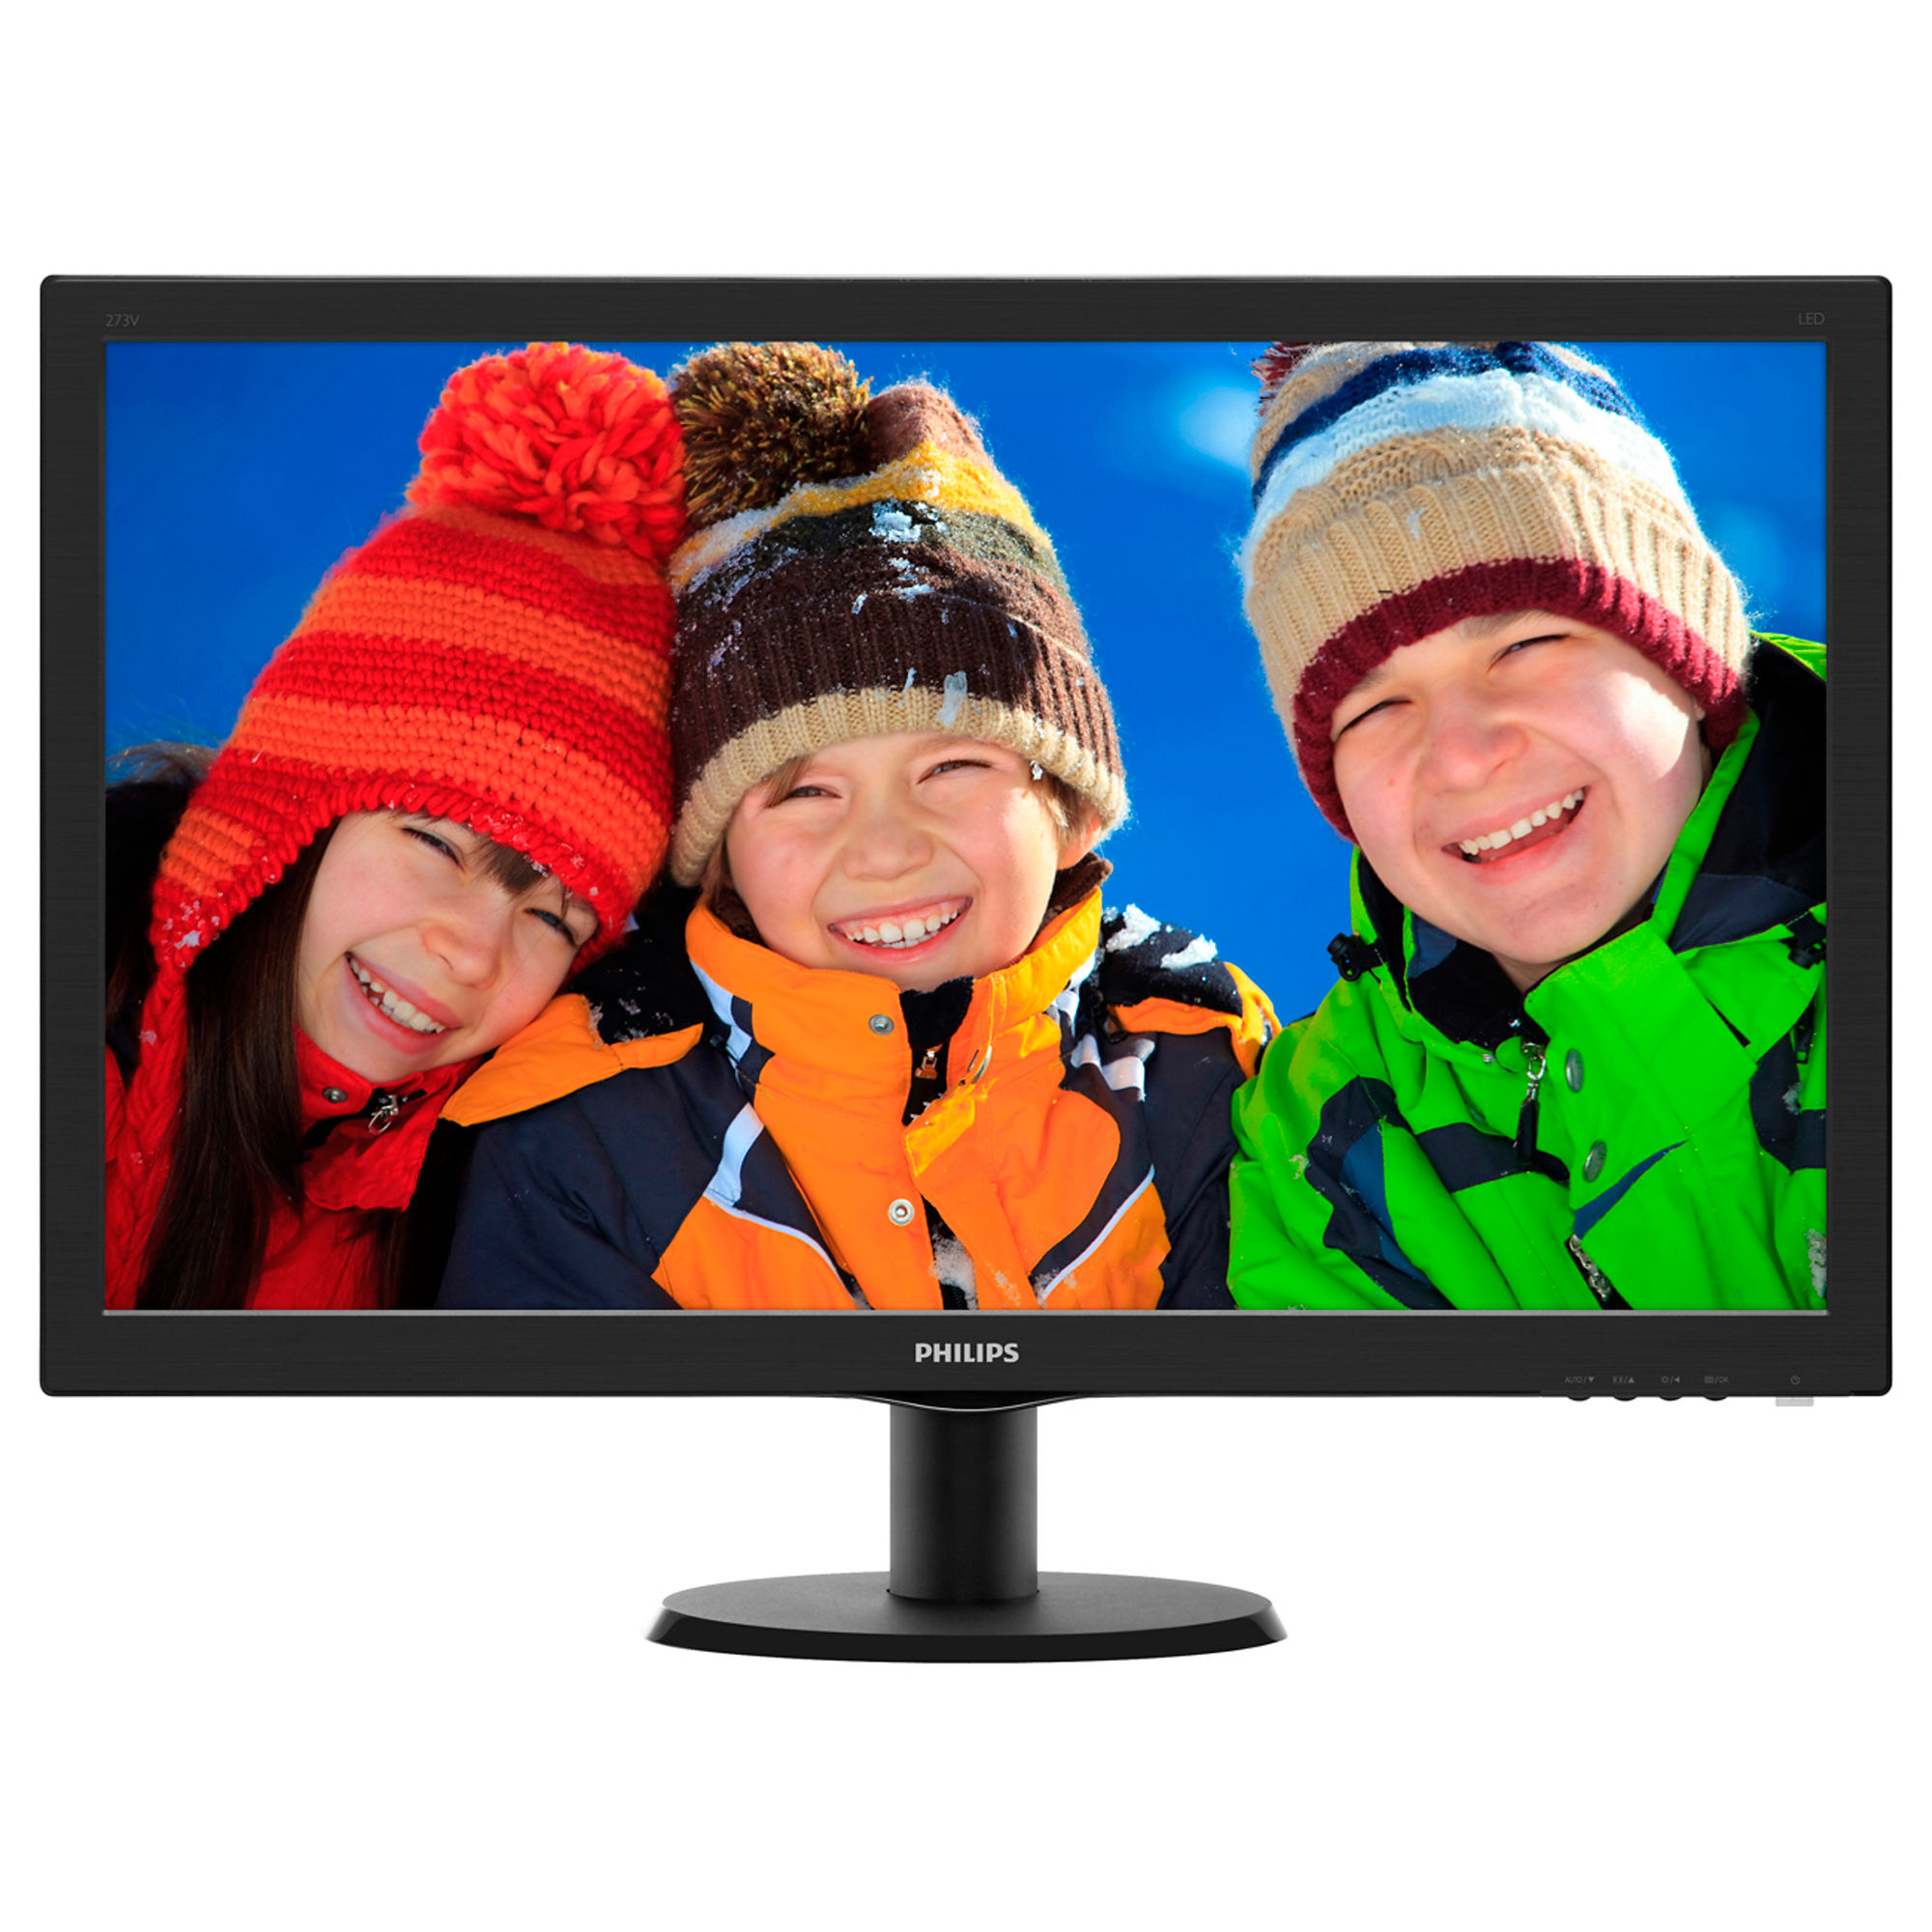 Monitor LED Philips 273V5LHSB/00 27 1920x1080 Black